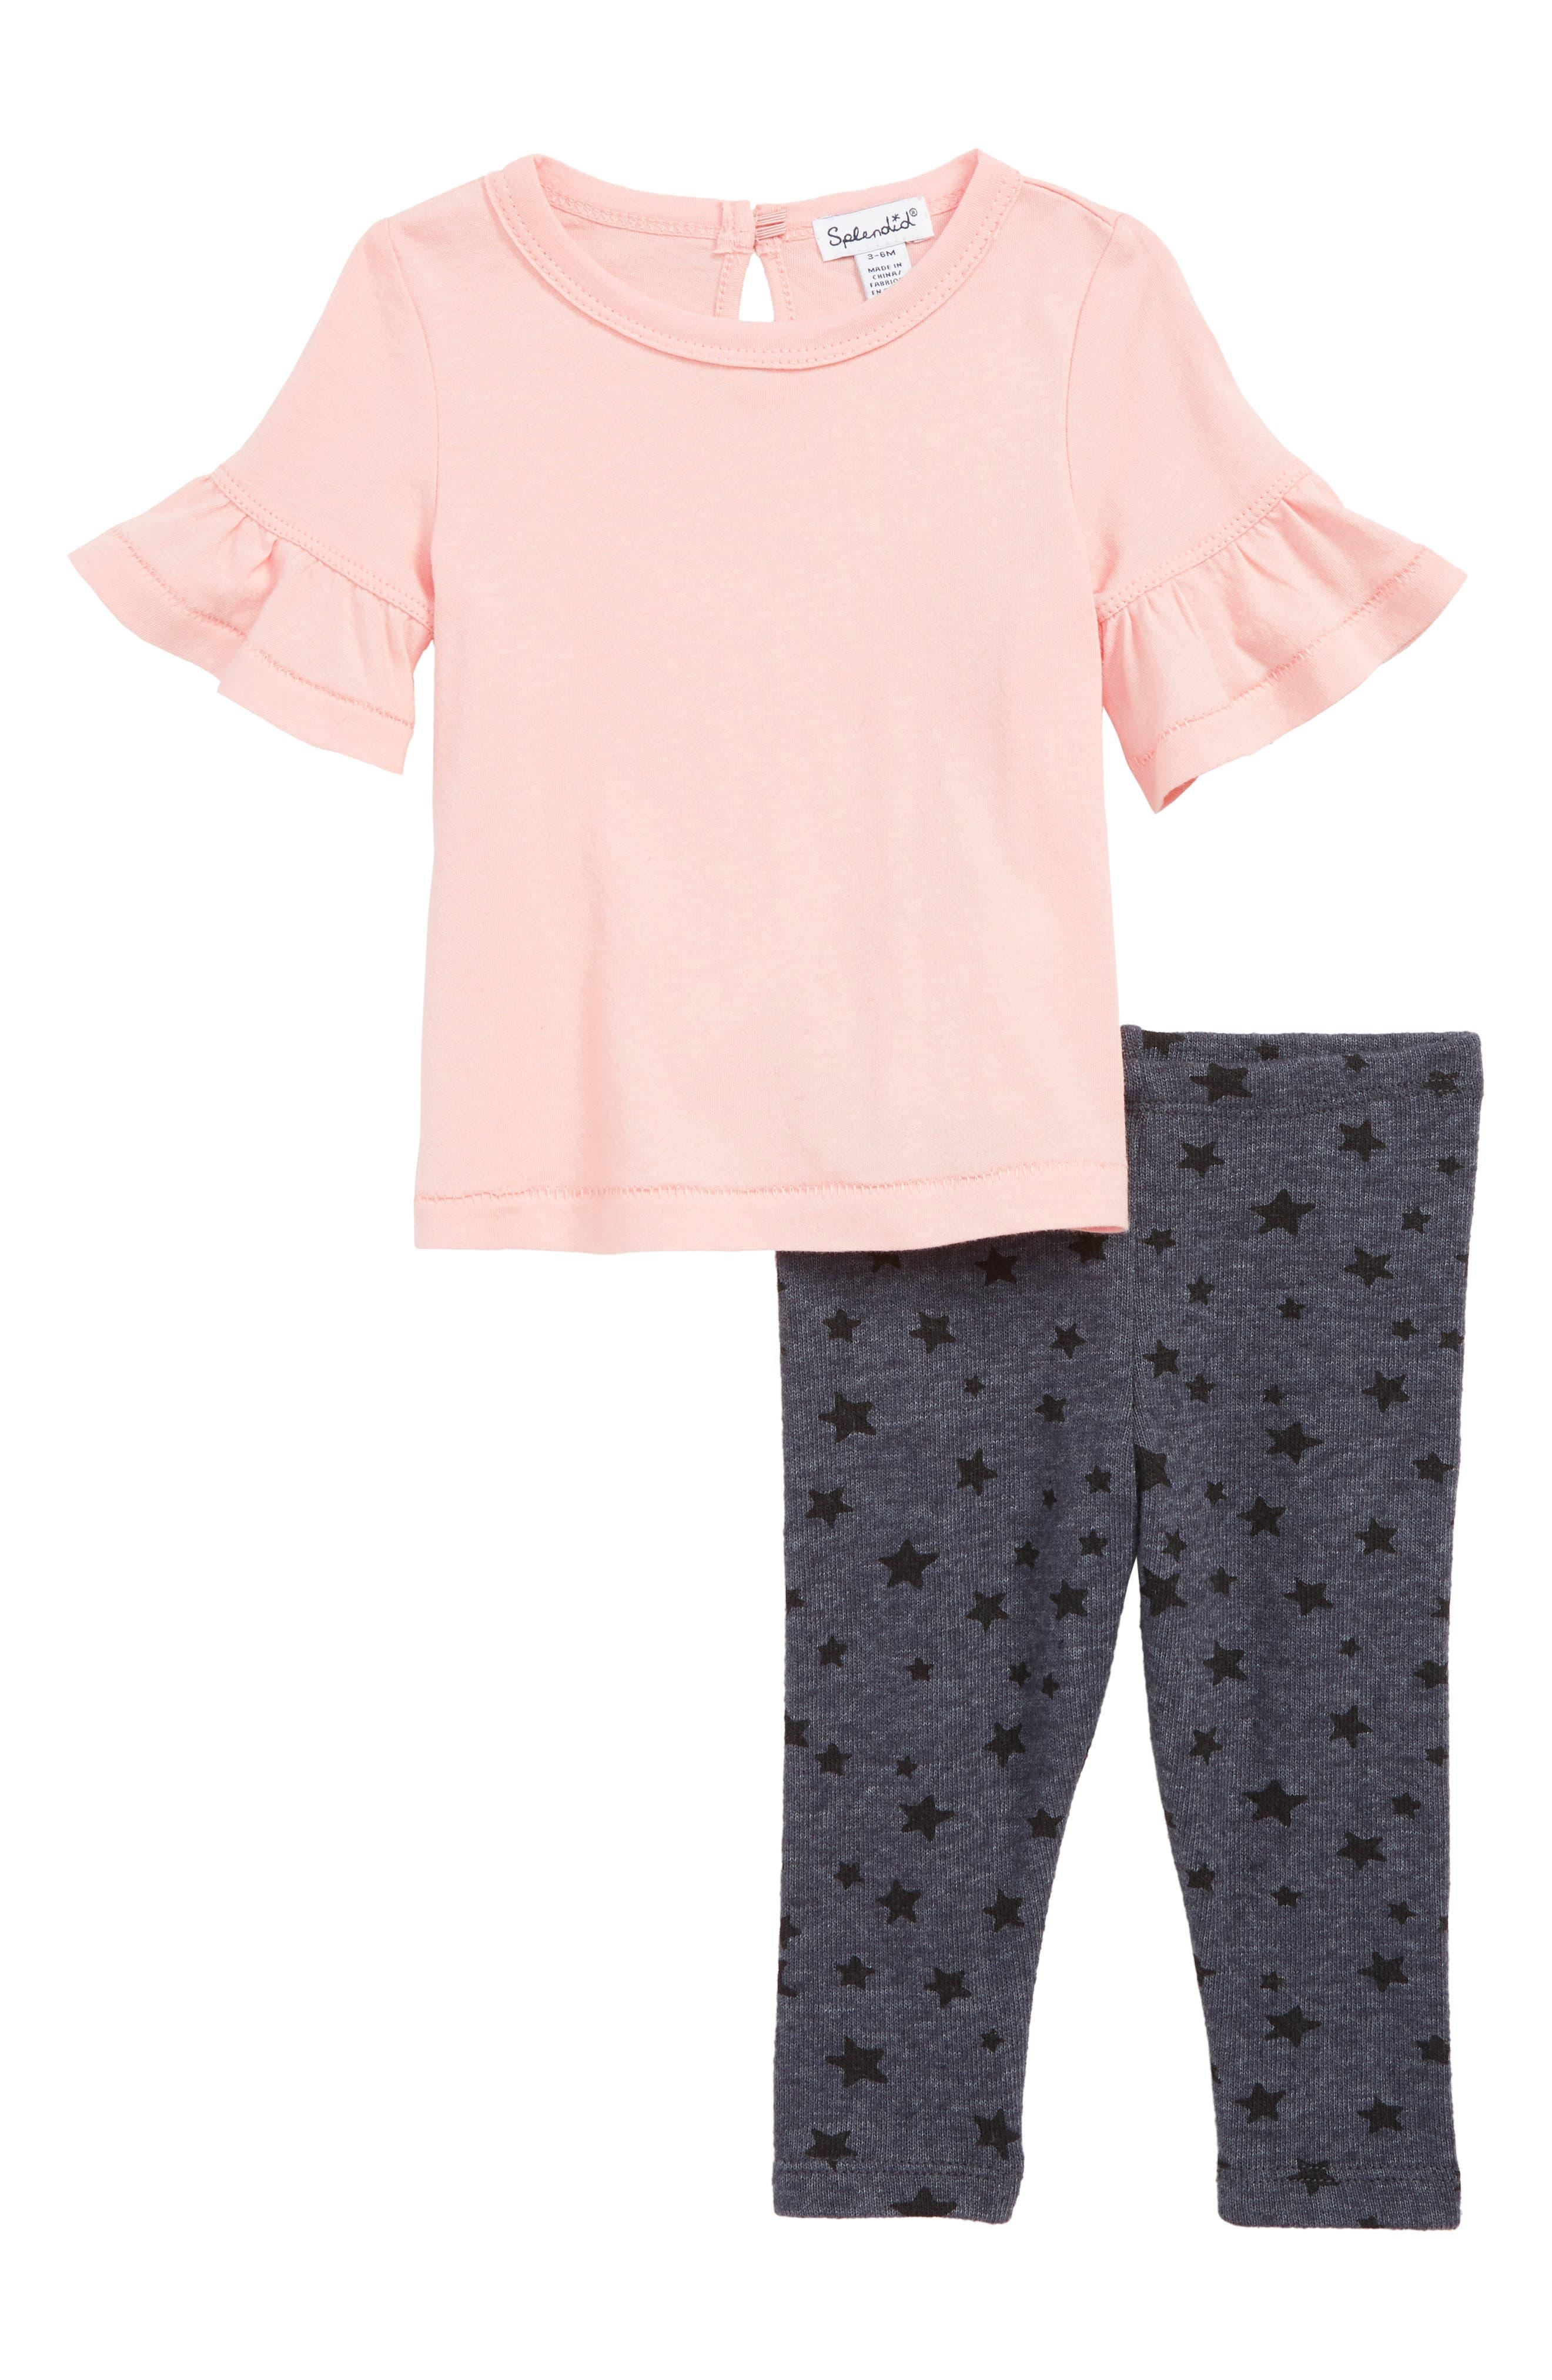 SPLENDID, Ruffle T-Shirt & Star Leggings Set, Main thumbnail 1, color, ANTIQUE PINK BEIGE